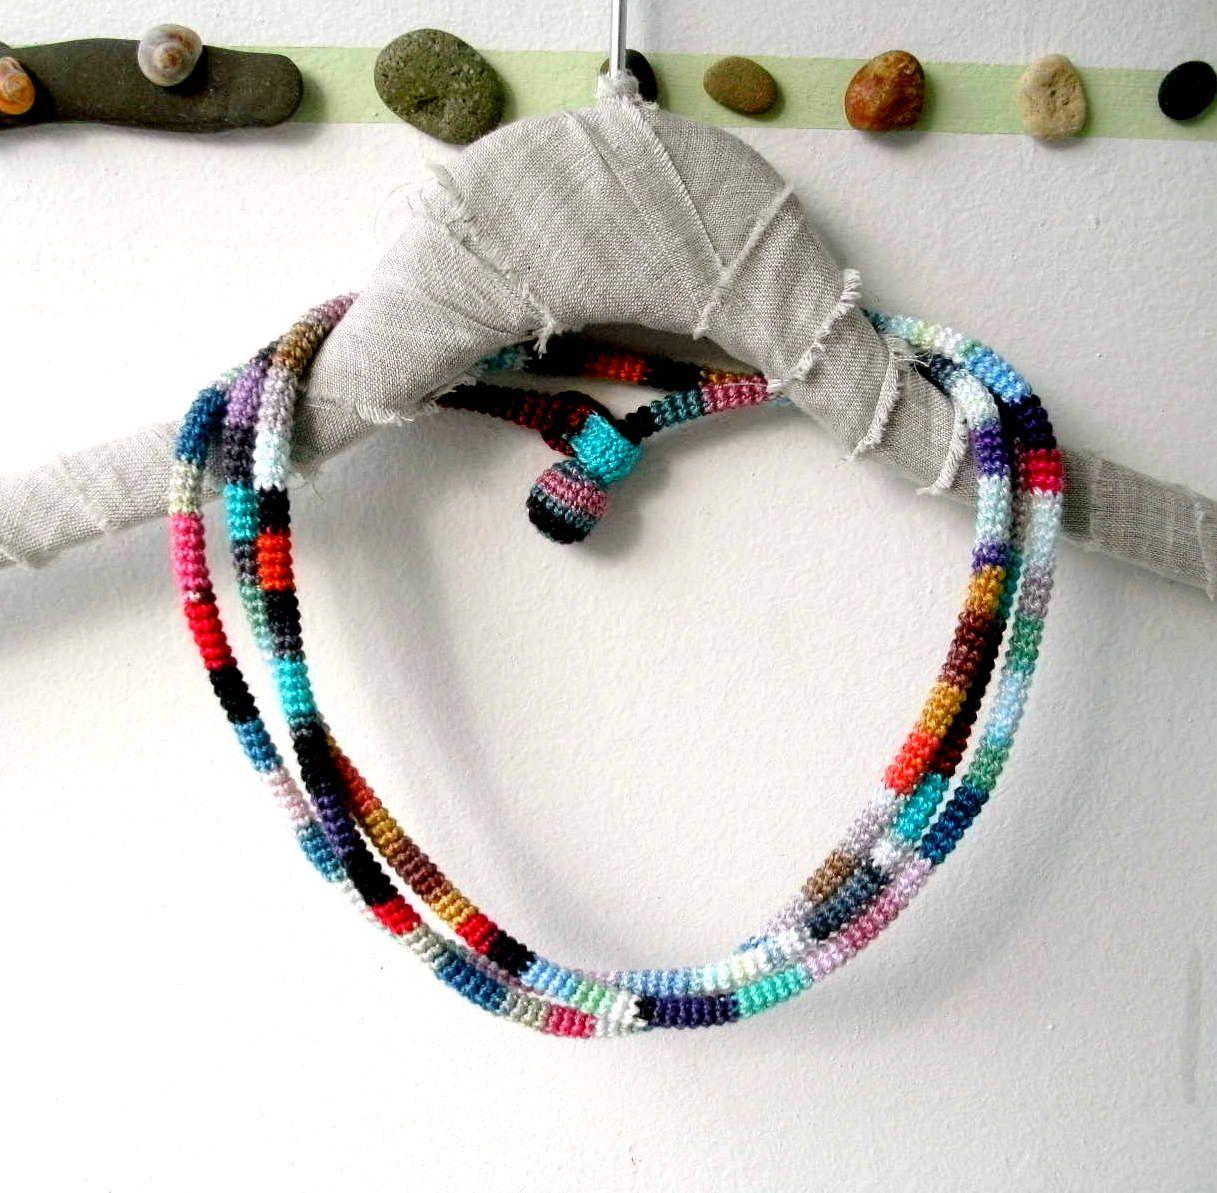 Crochet Wrap Necklace / Bracelet - Crochet Wrap Bracelet - Versatile Crochet Jewelry  - Colorful - Extra Long - OOAK. $49.00, via Etsy.